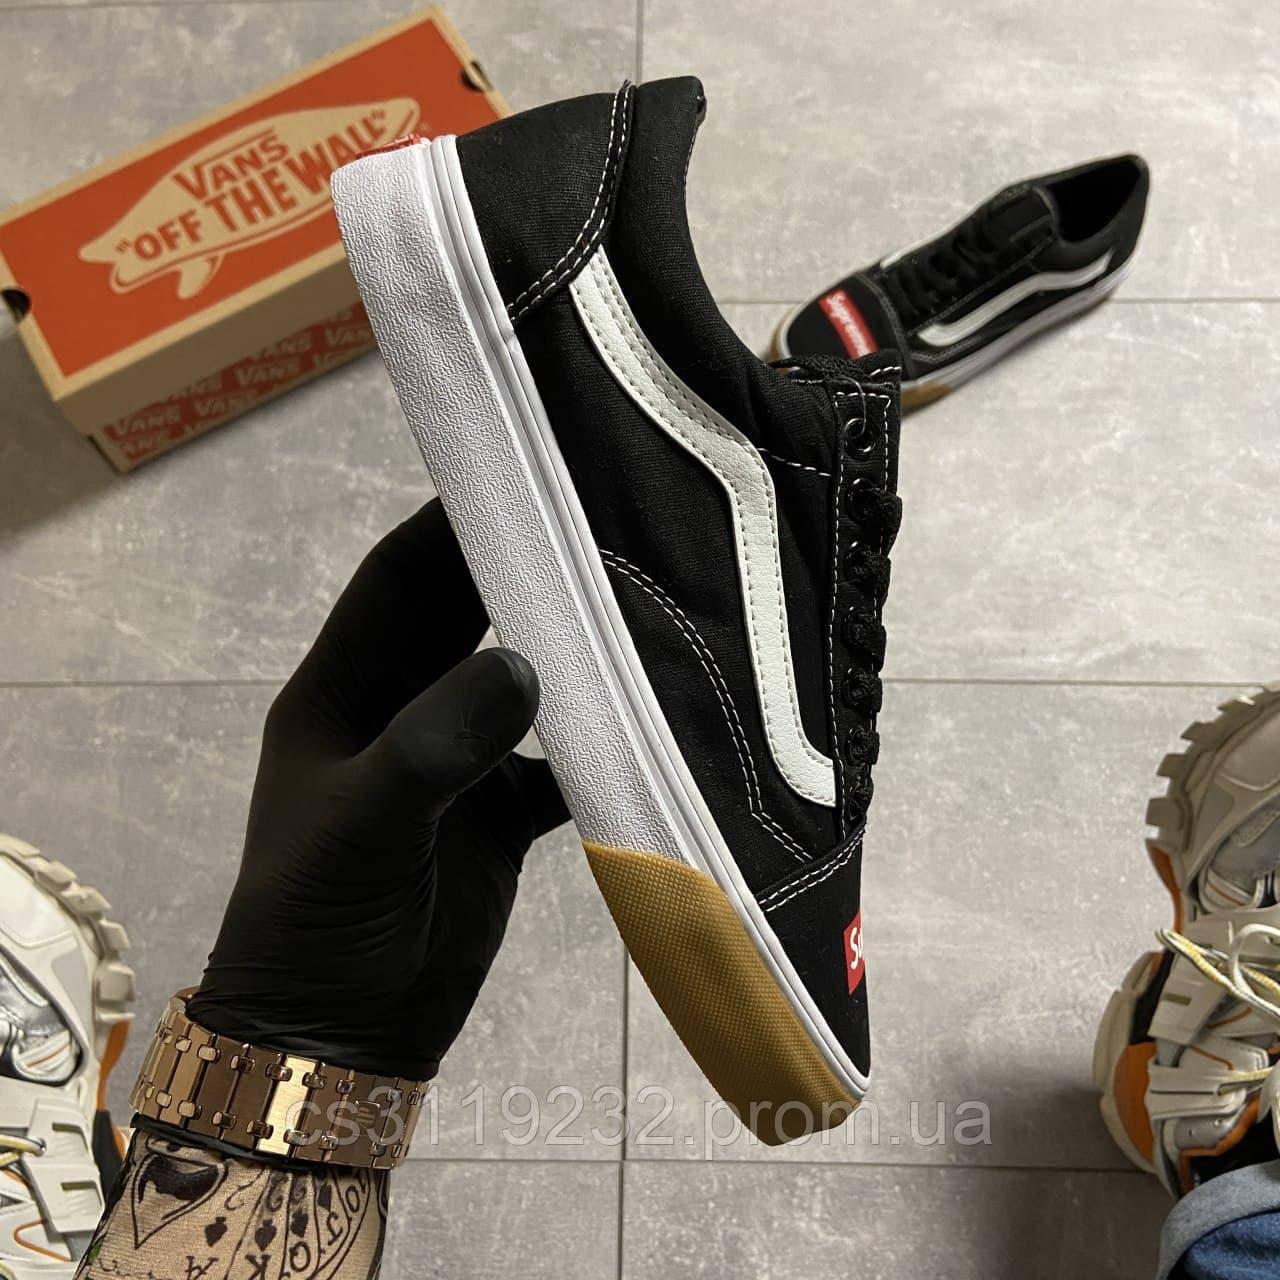 Женские кеды Vans Old Skool Black/White SUPREME (черные)